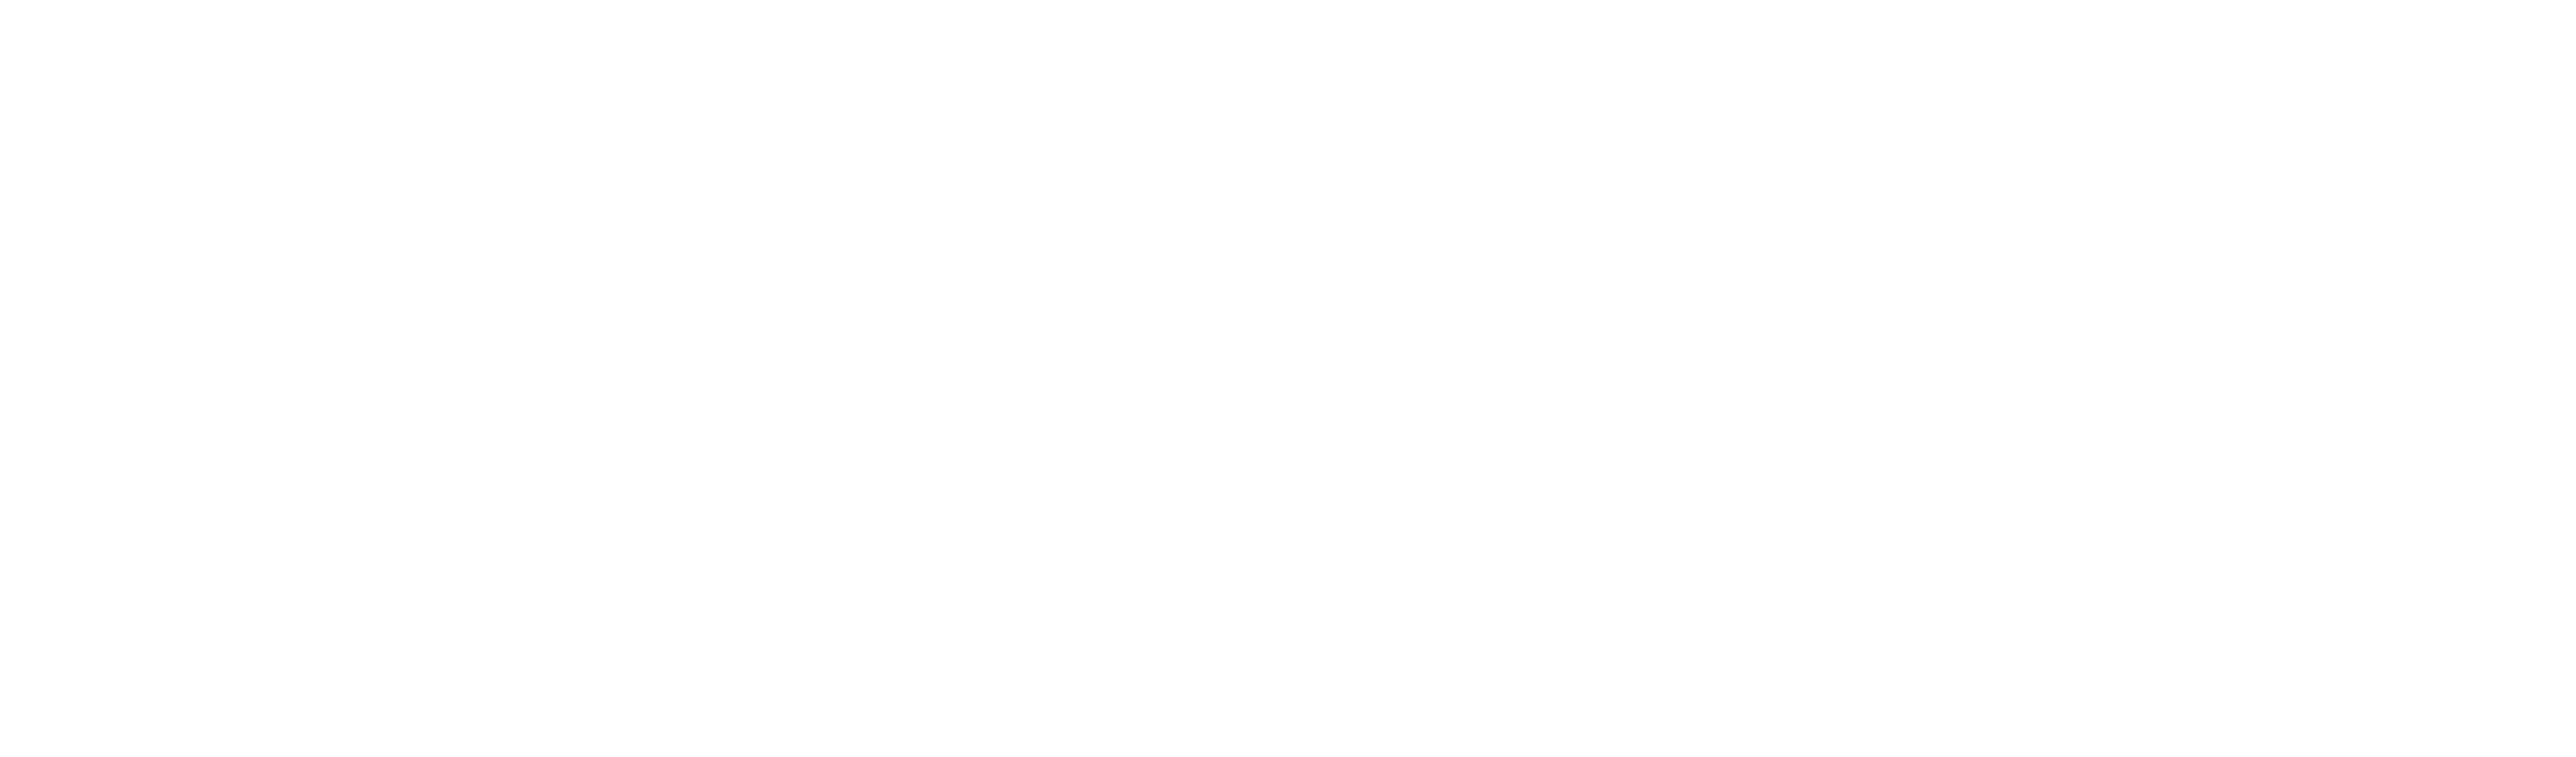 IBM 3 - White